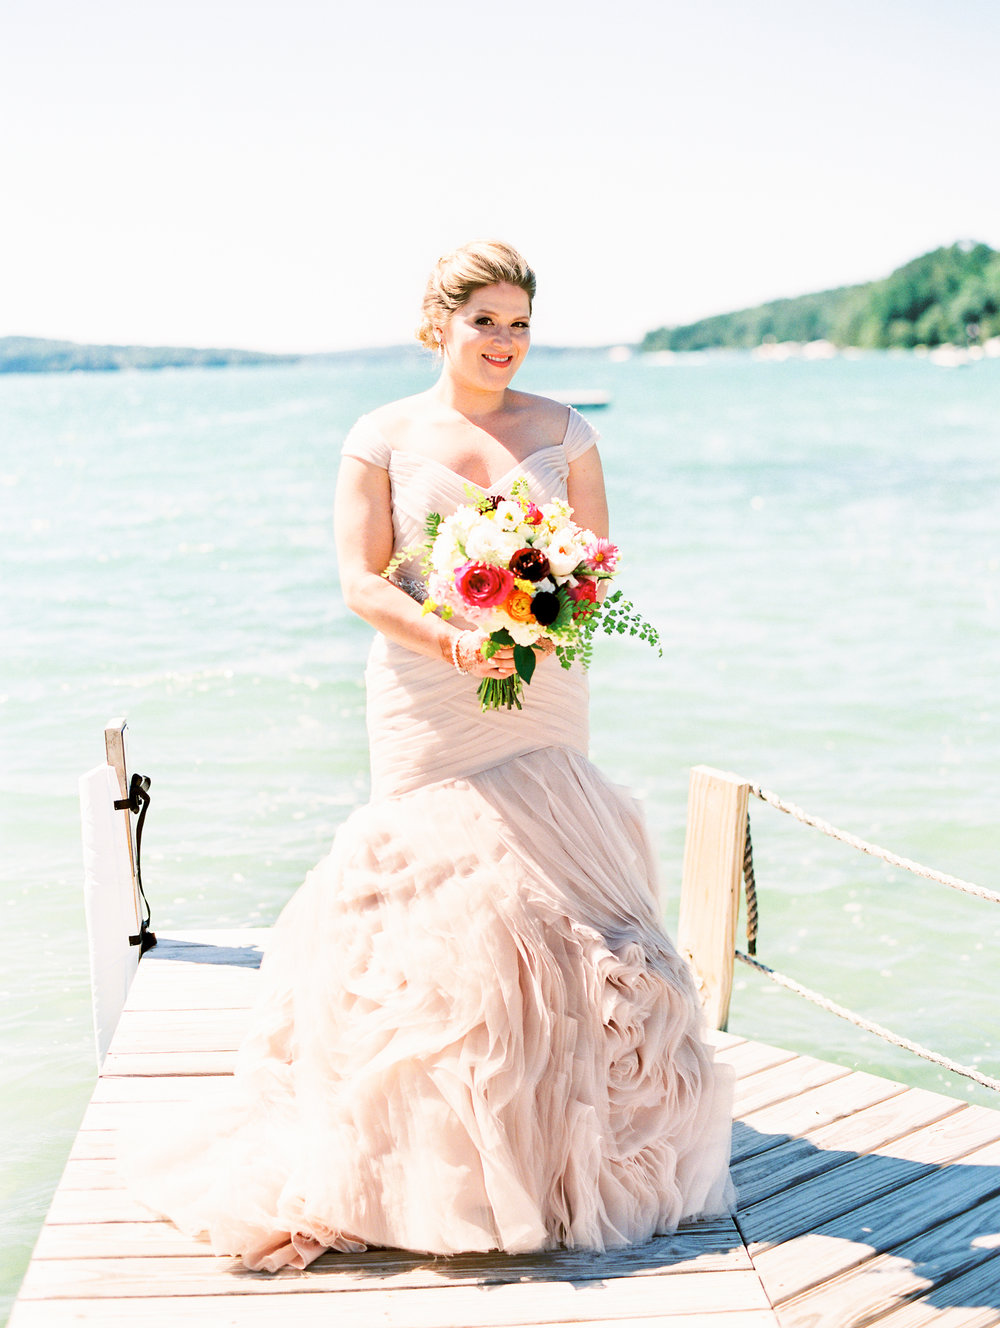 Govathoti+Wedding+First+Look-36.jpg